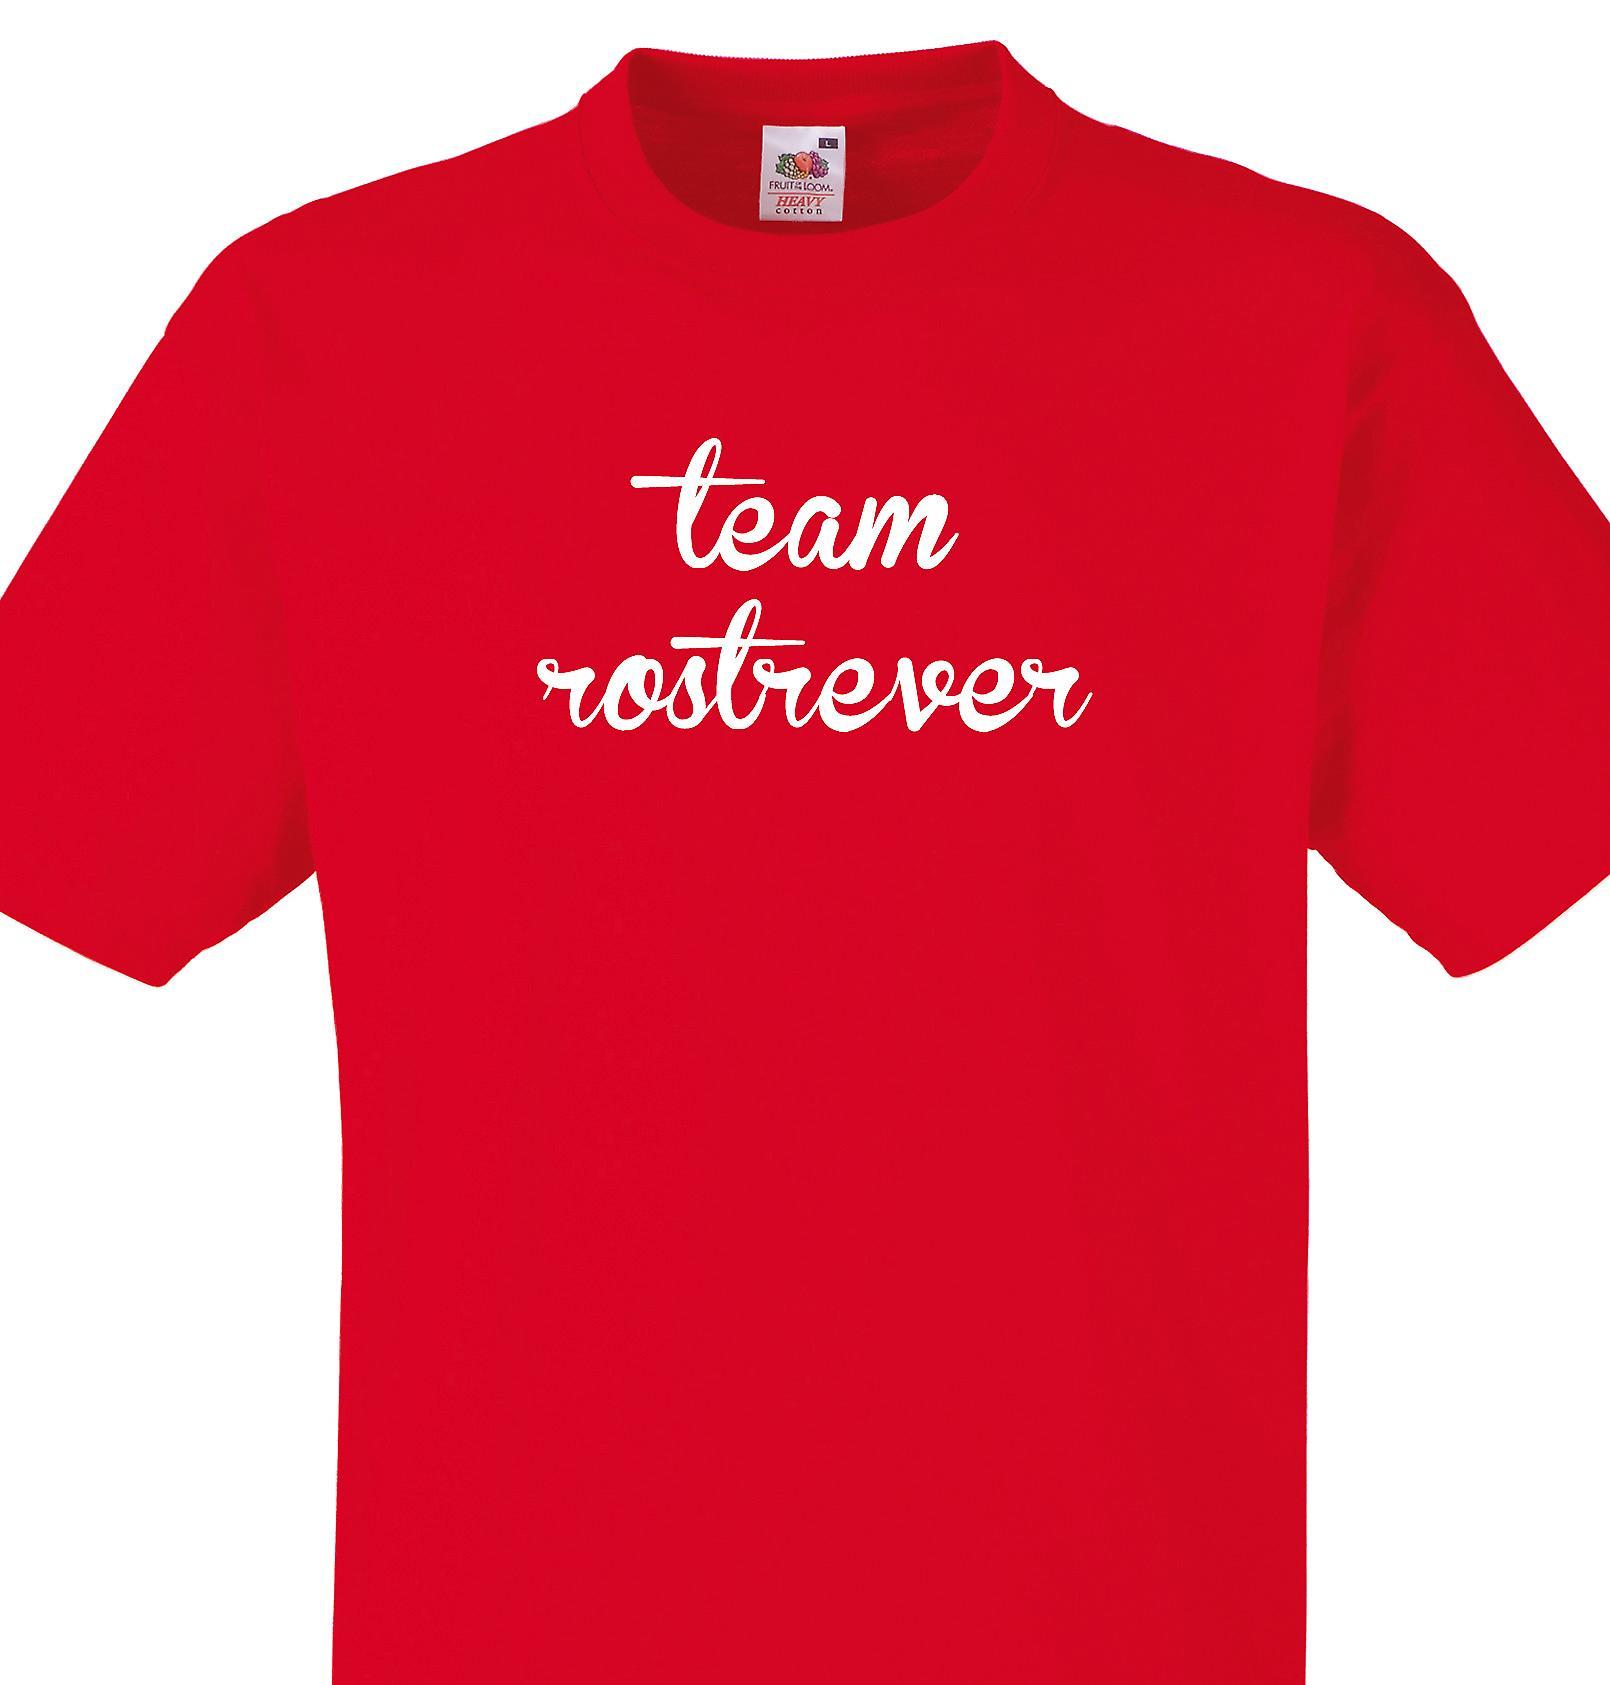 Team Rostrever Red T shirt